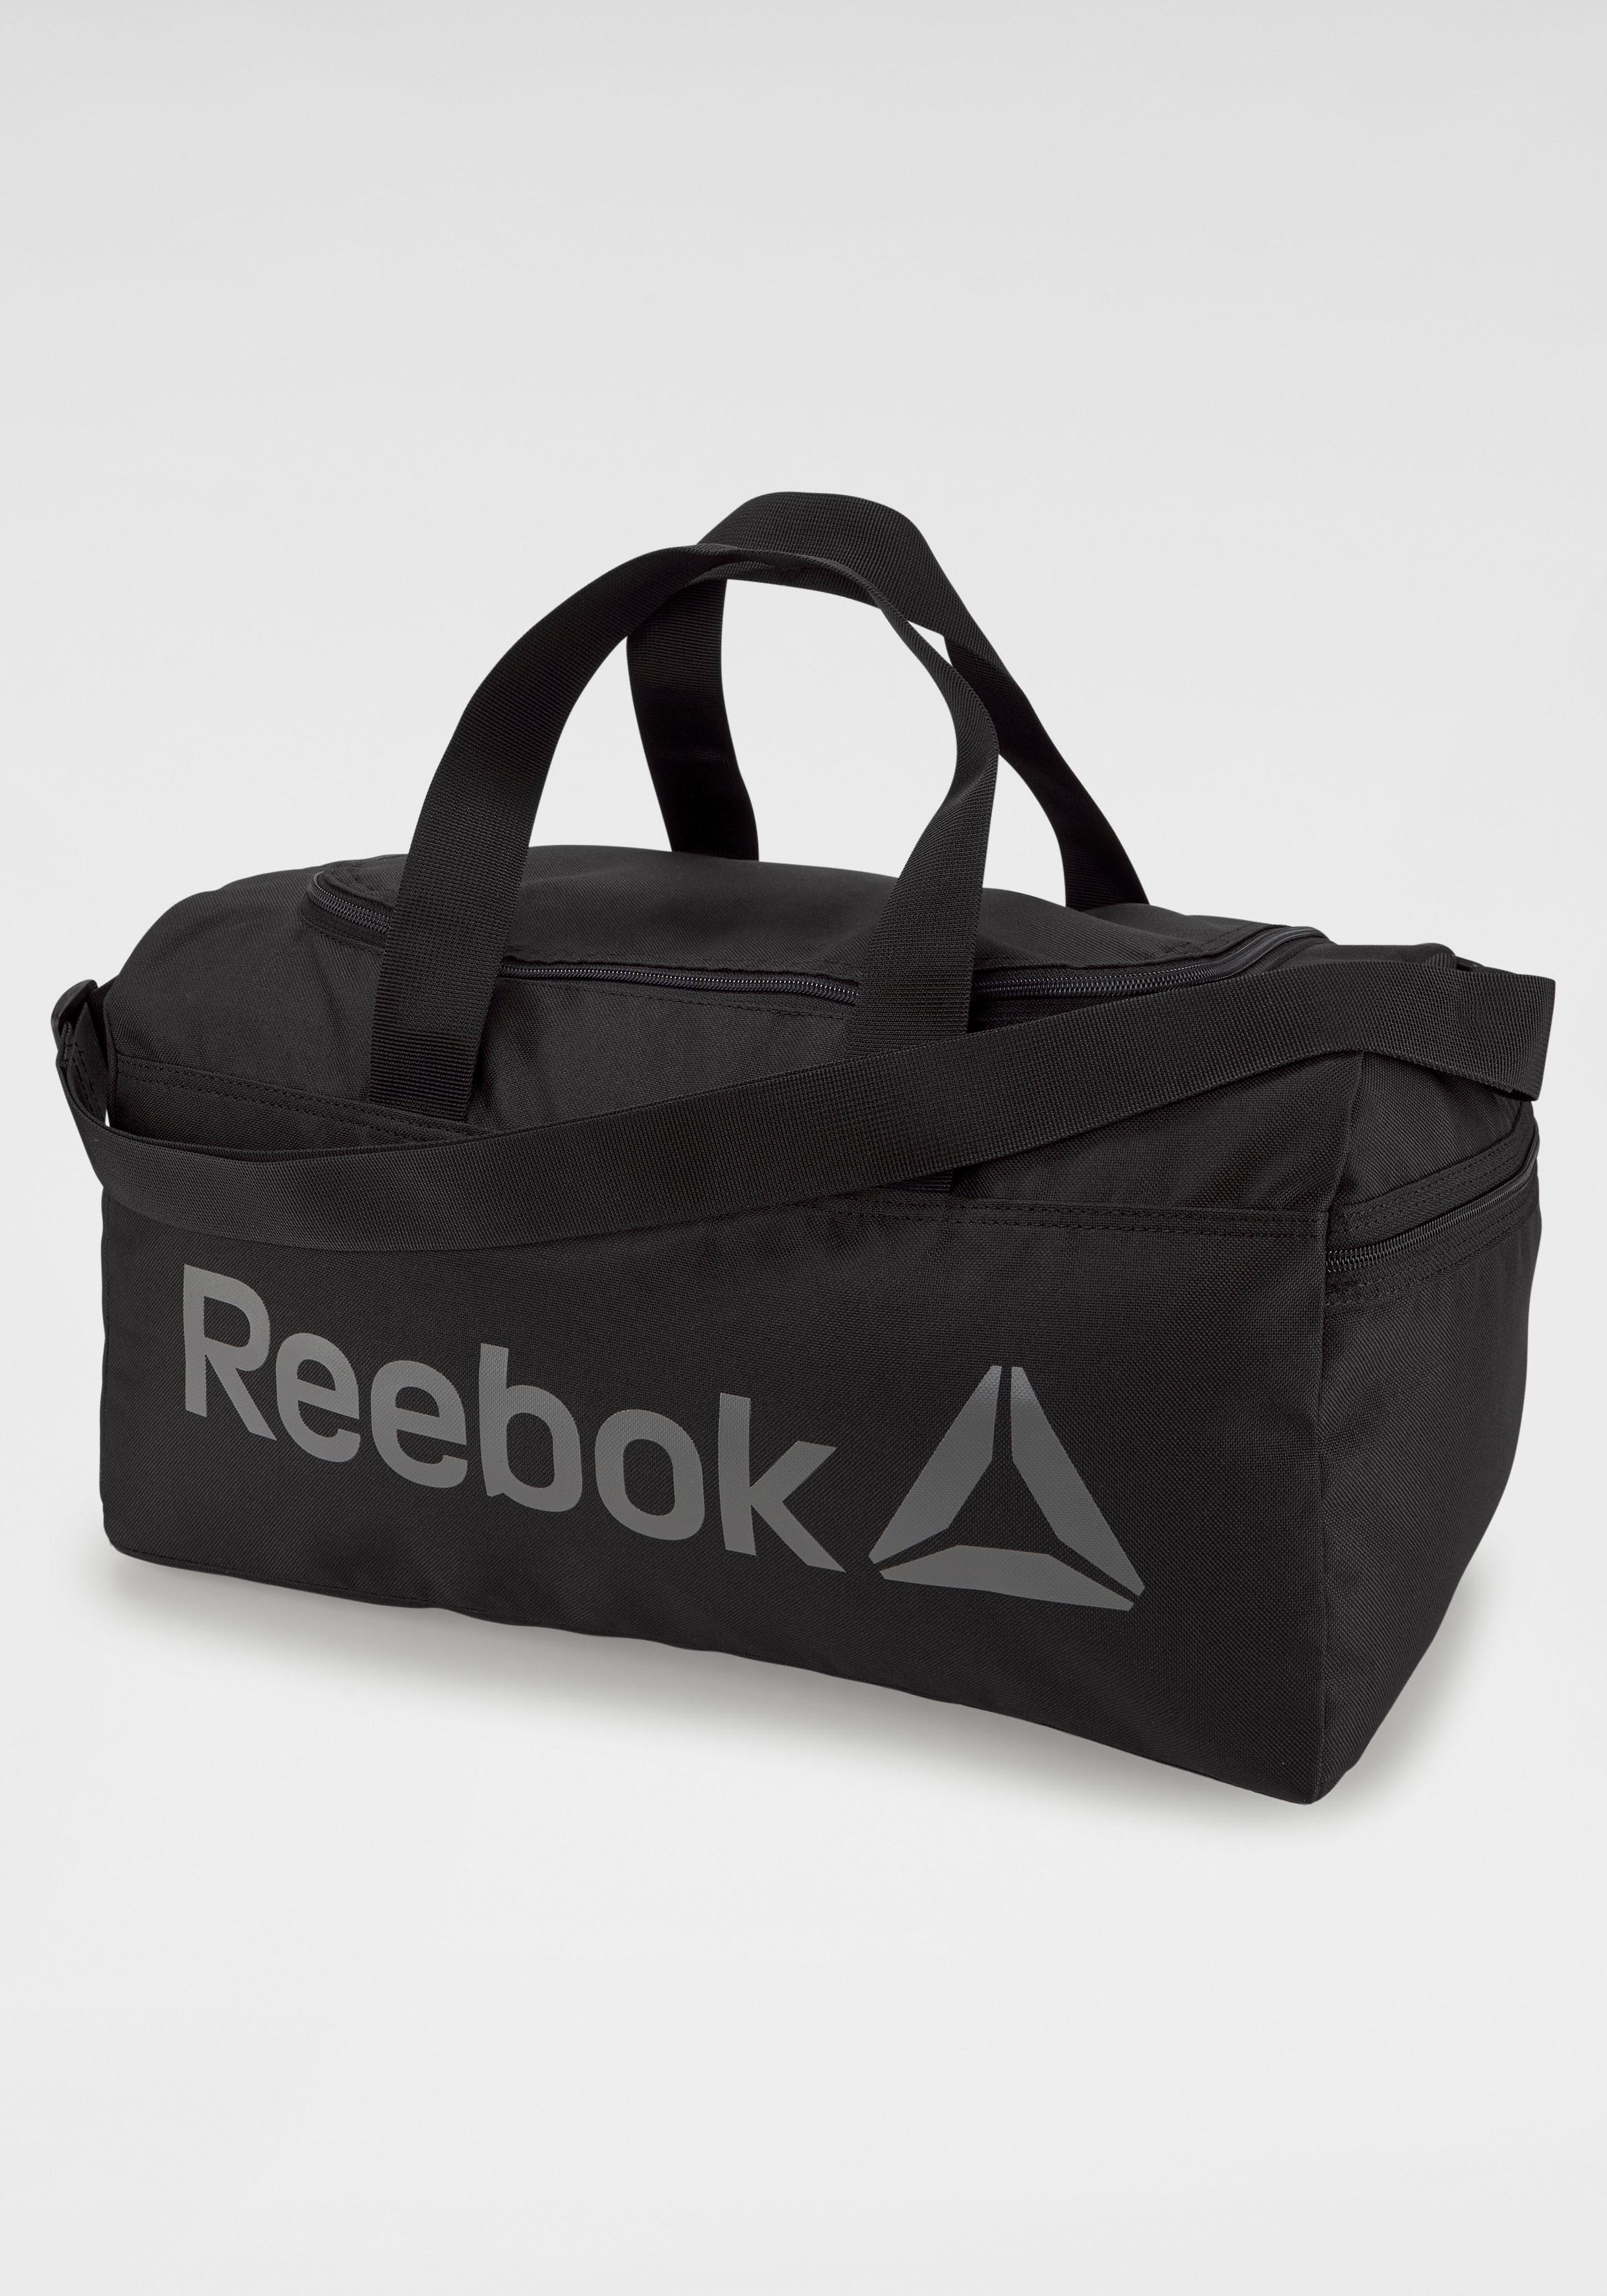 Reebok sporttas - gratis ruilen op otto.nl